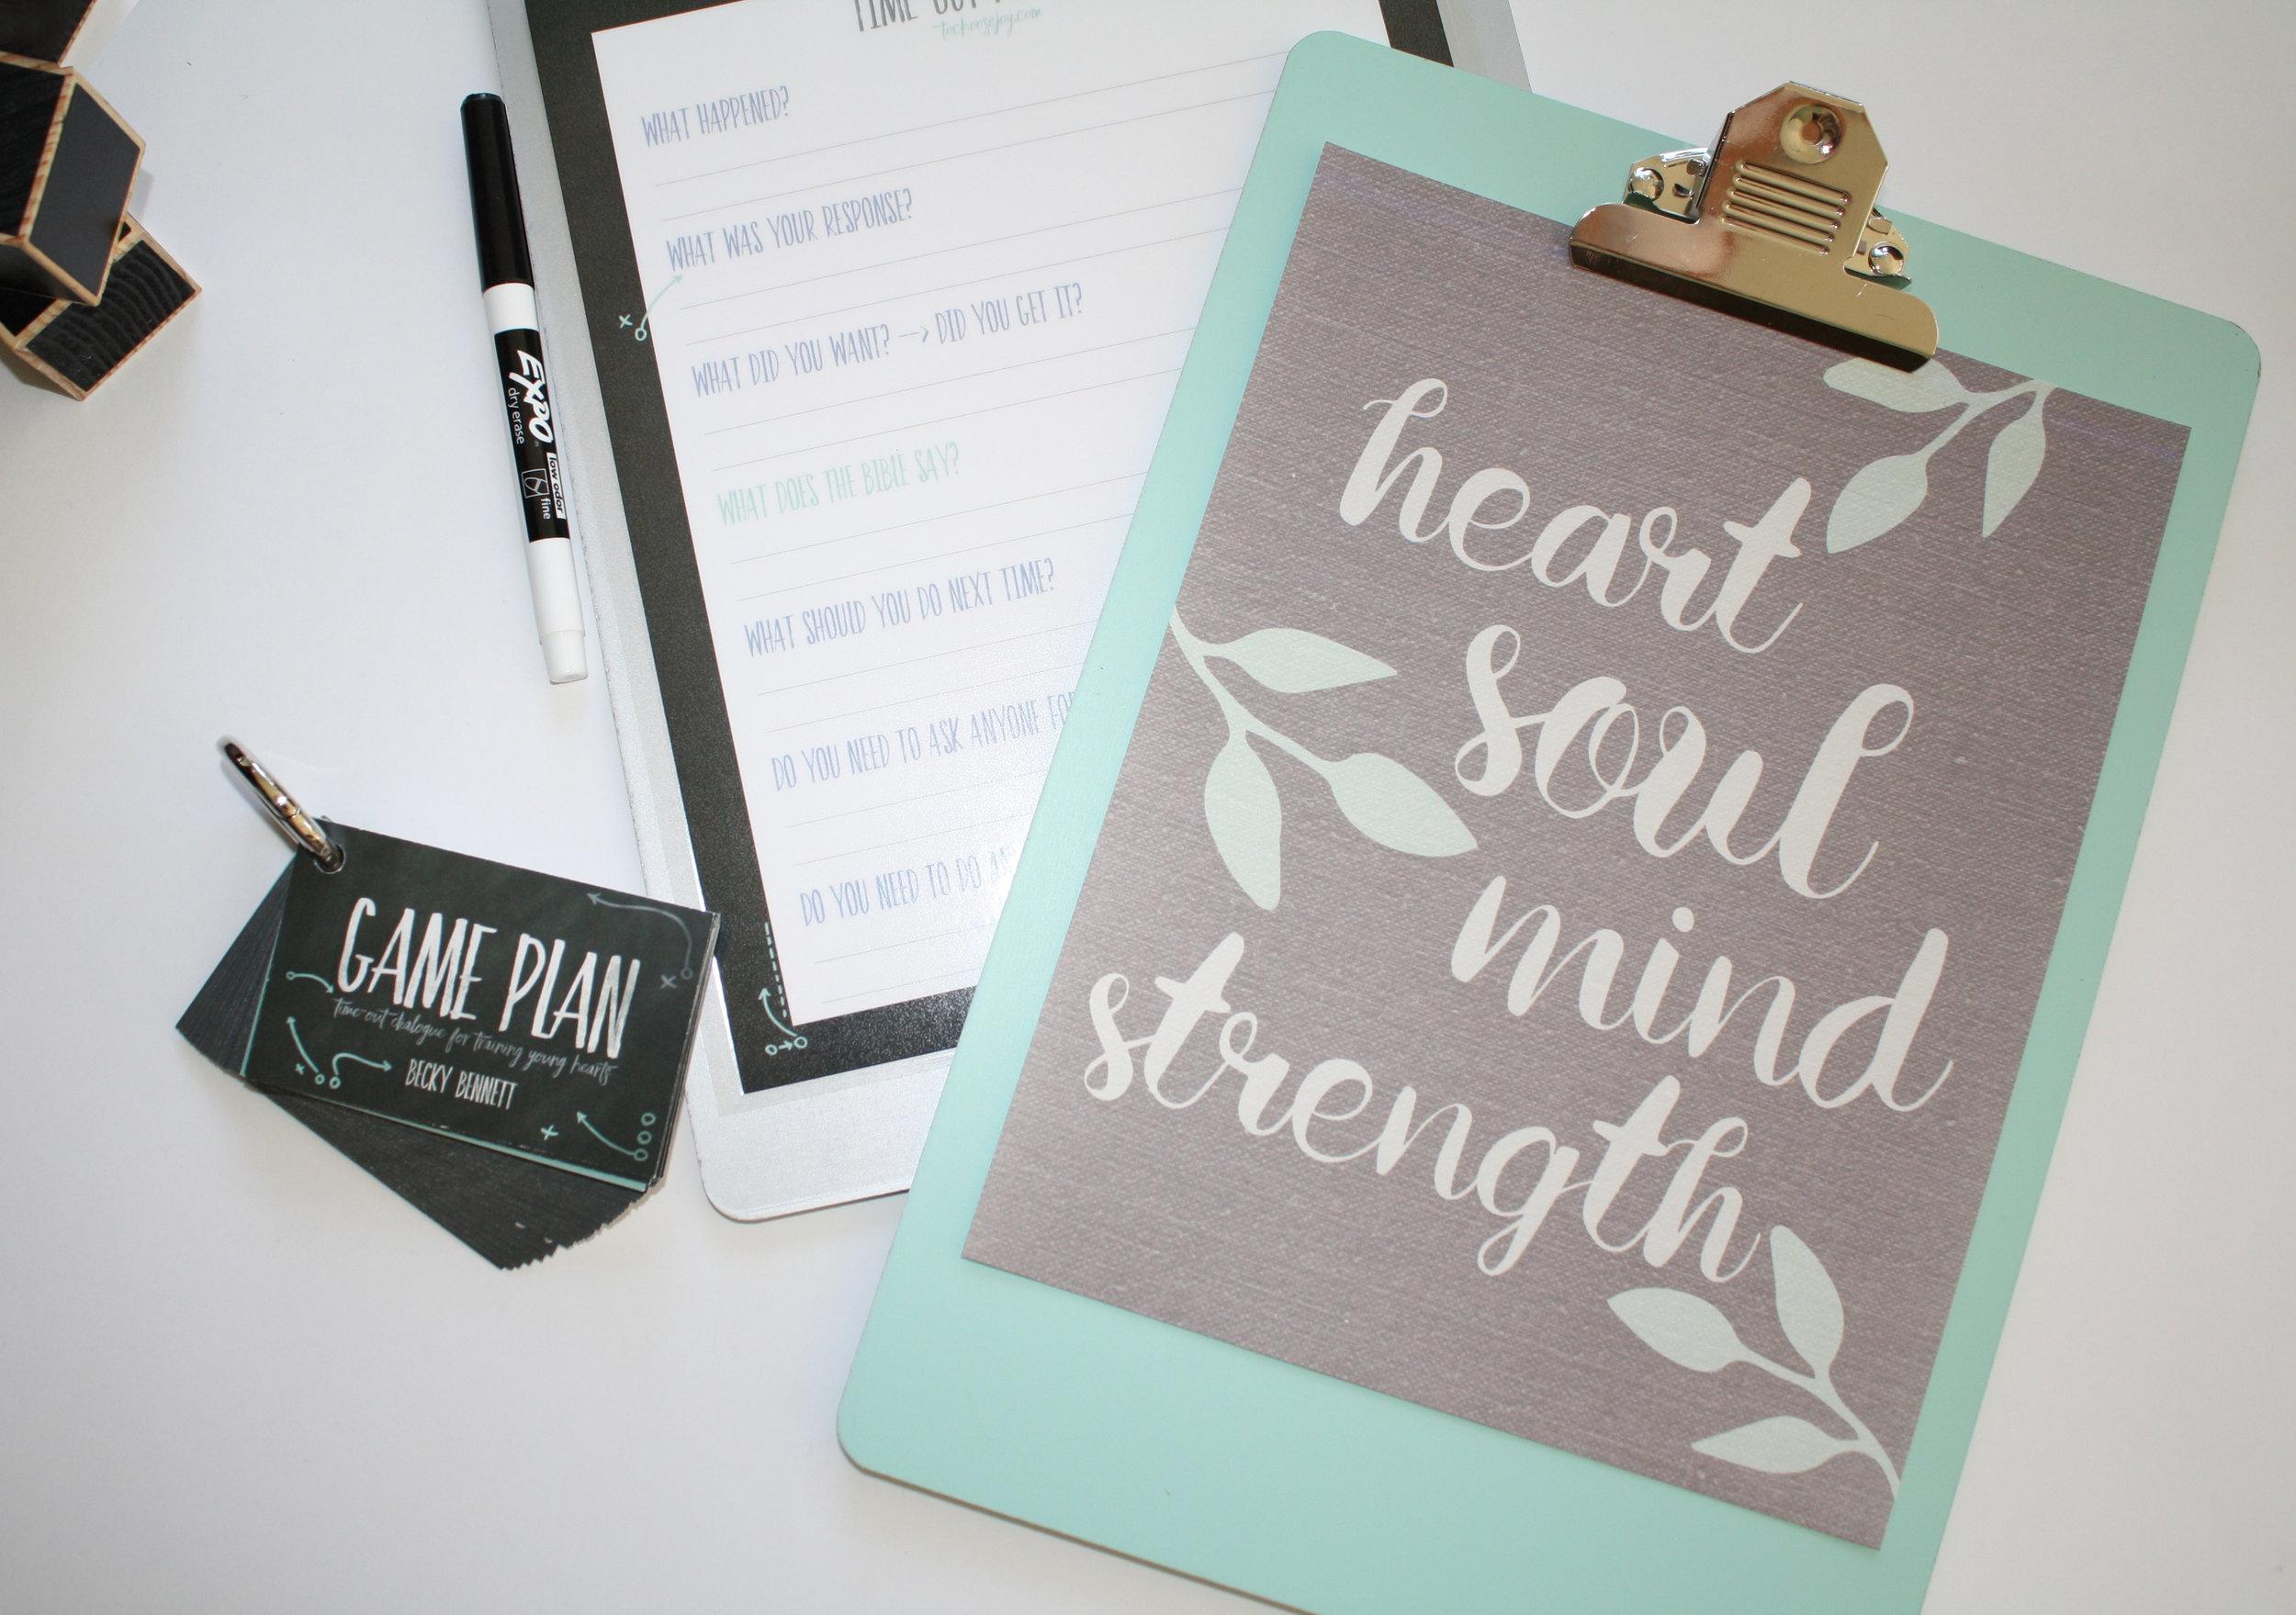 Game Plan_Deuteronomy 6_Becky Bennett_Heart Soul Mind Strength